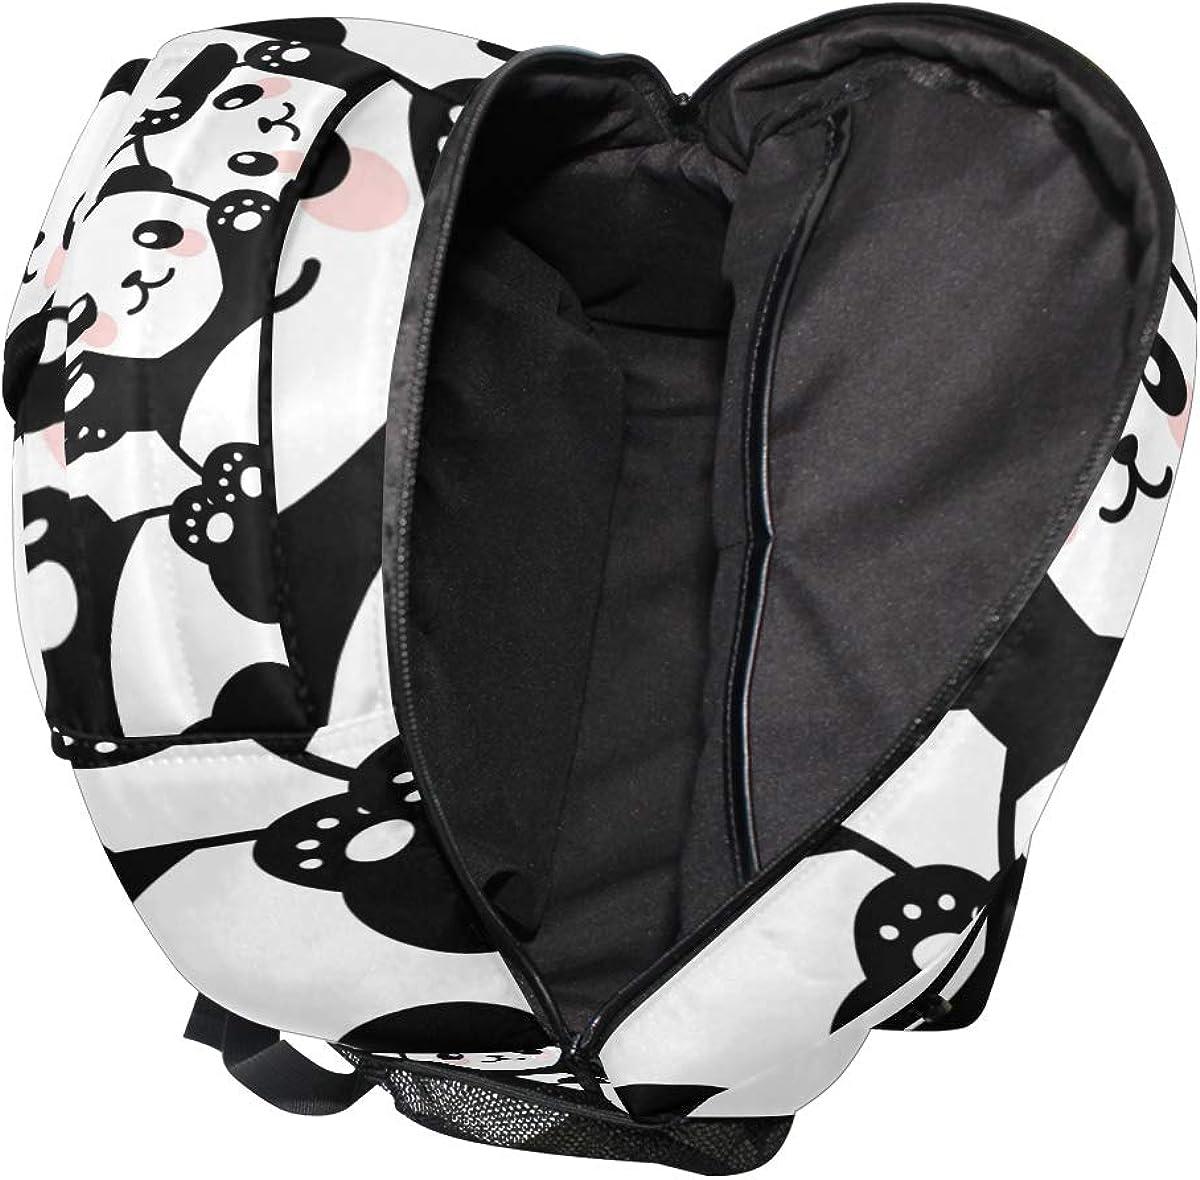 MAPOLO Laptop Backpack Pandas Babies Climbing Casual Shoulder Daypack for Student School Bag Handbag Lightweight